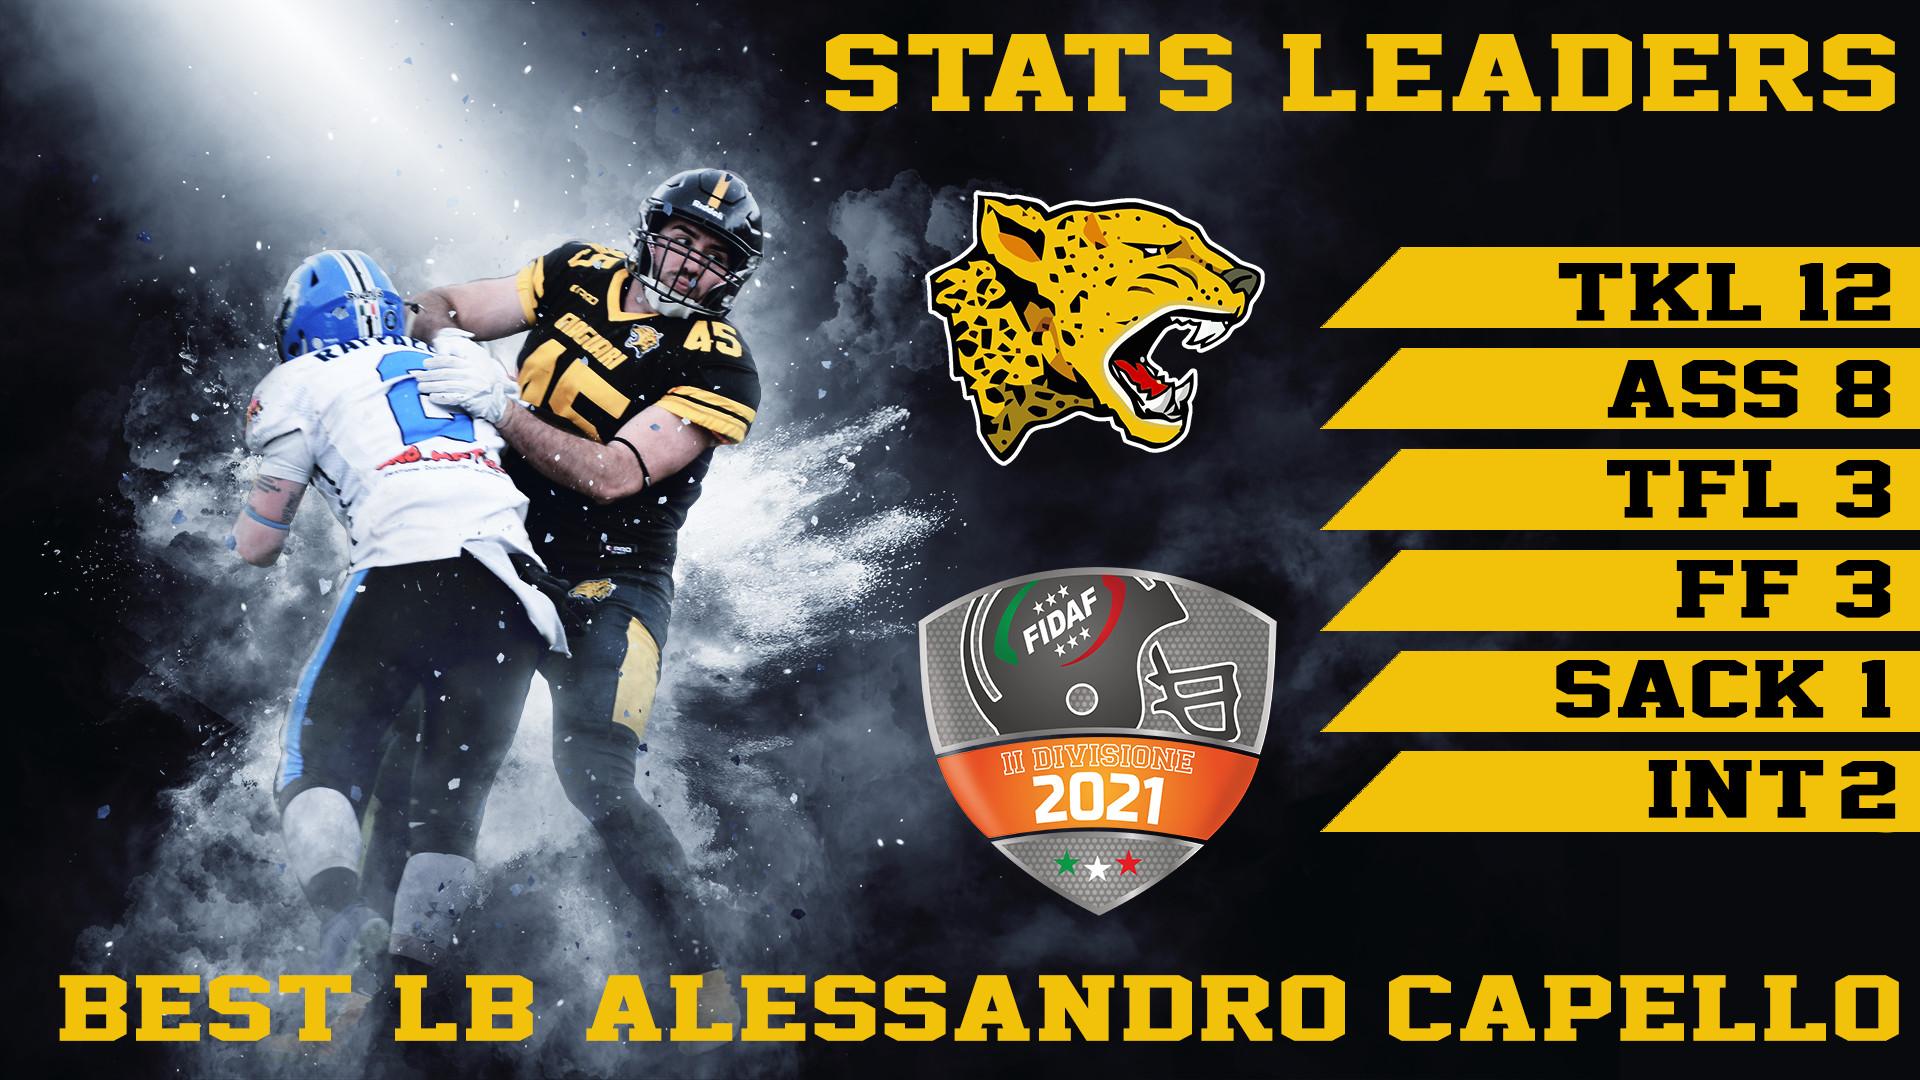 Stats_Leaders_LB